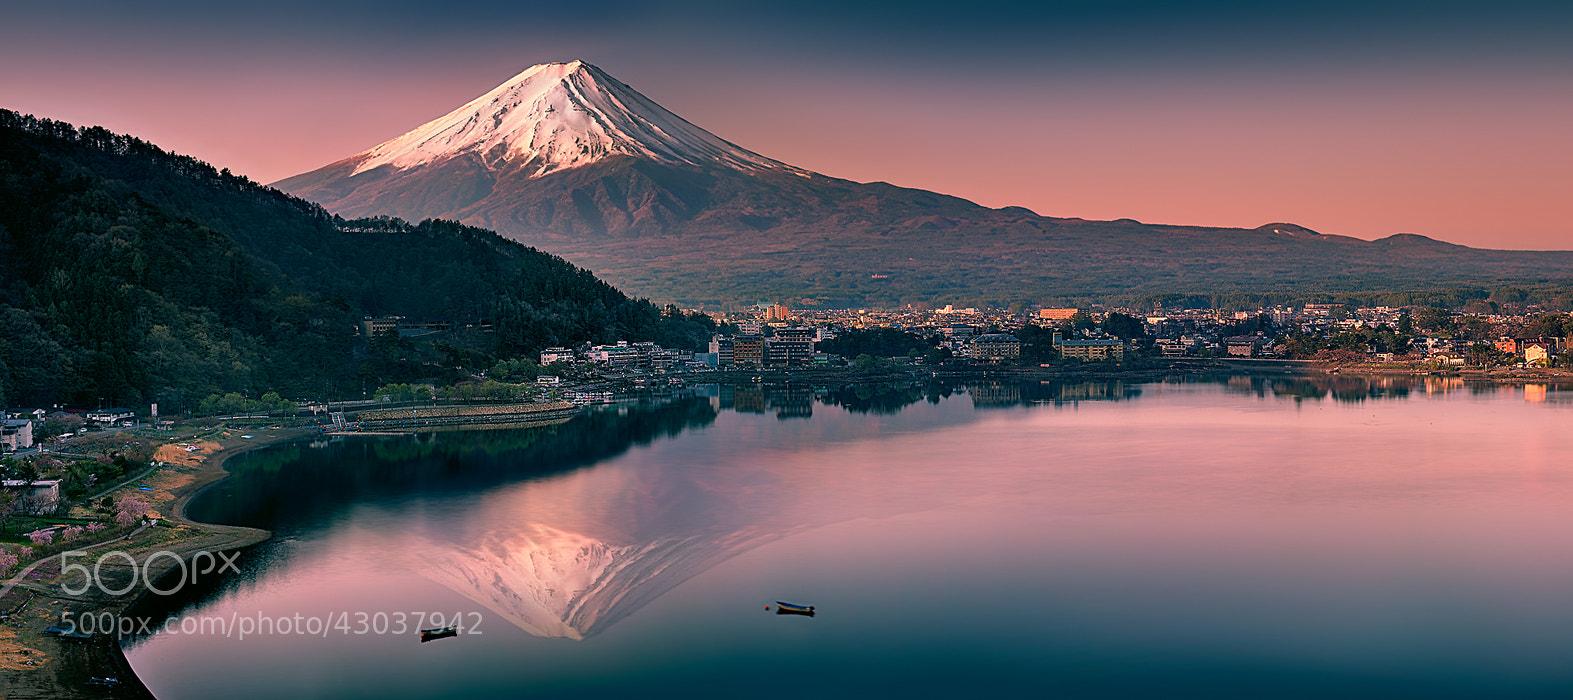 Photograph Kawaguchiko Panoramic View by Natasha Pnini on 500px